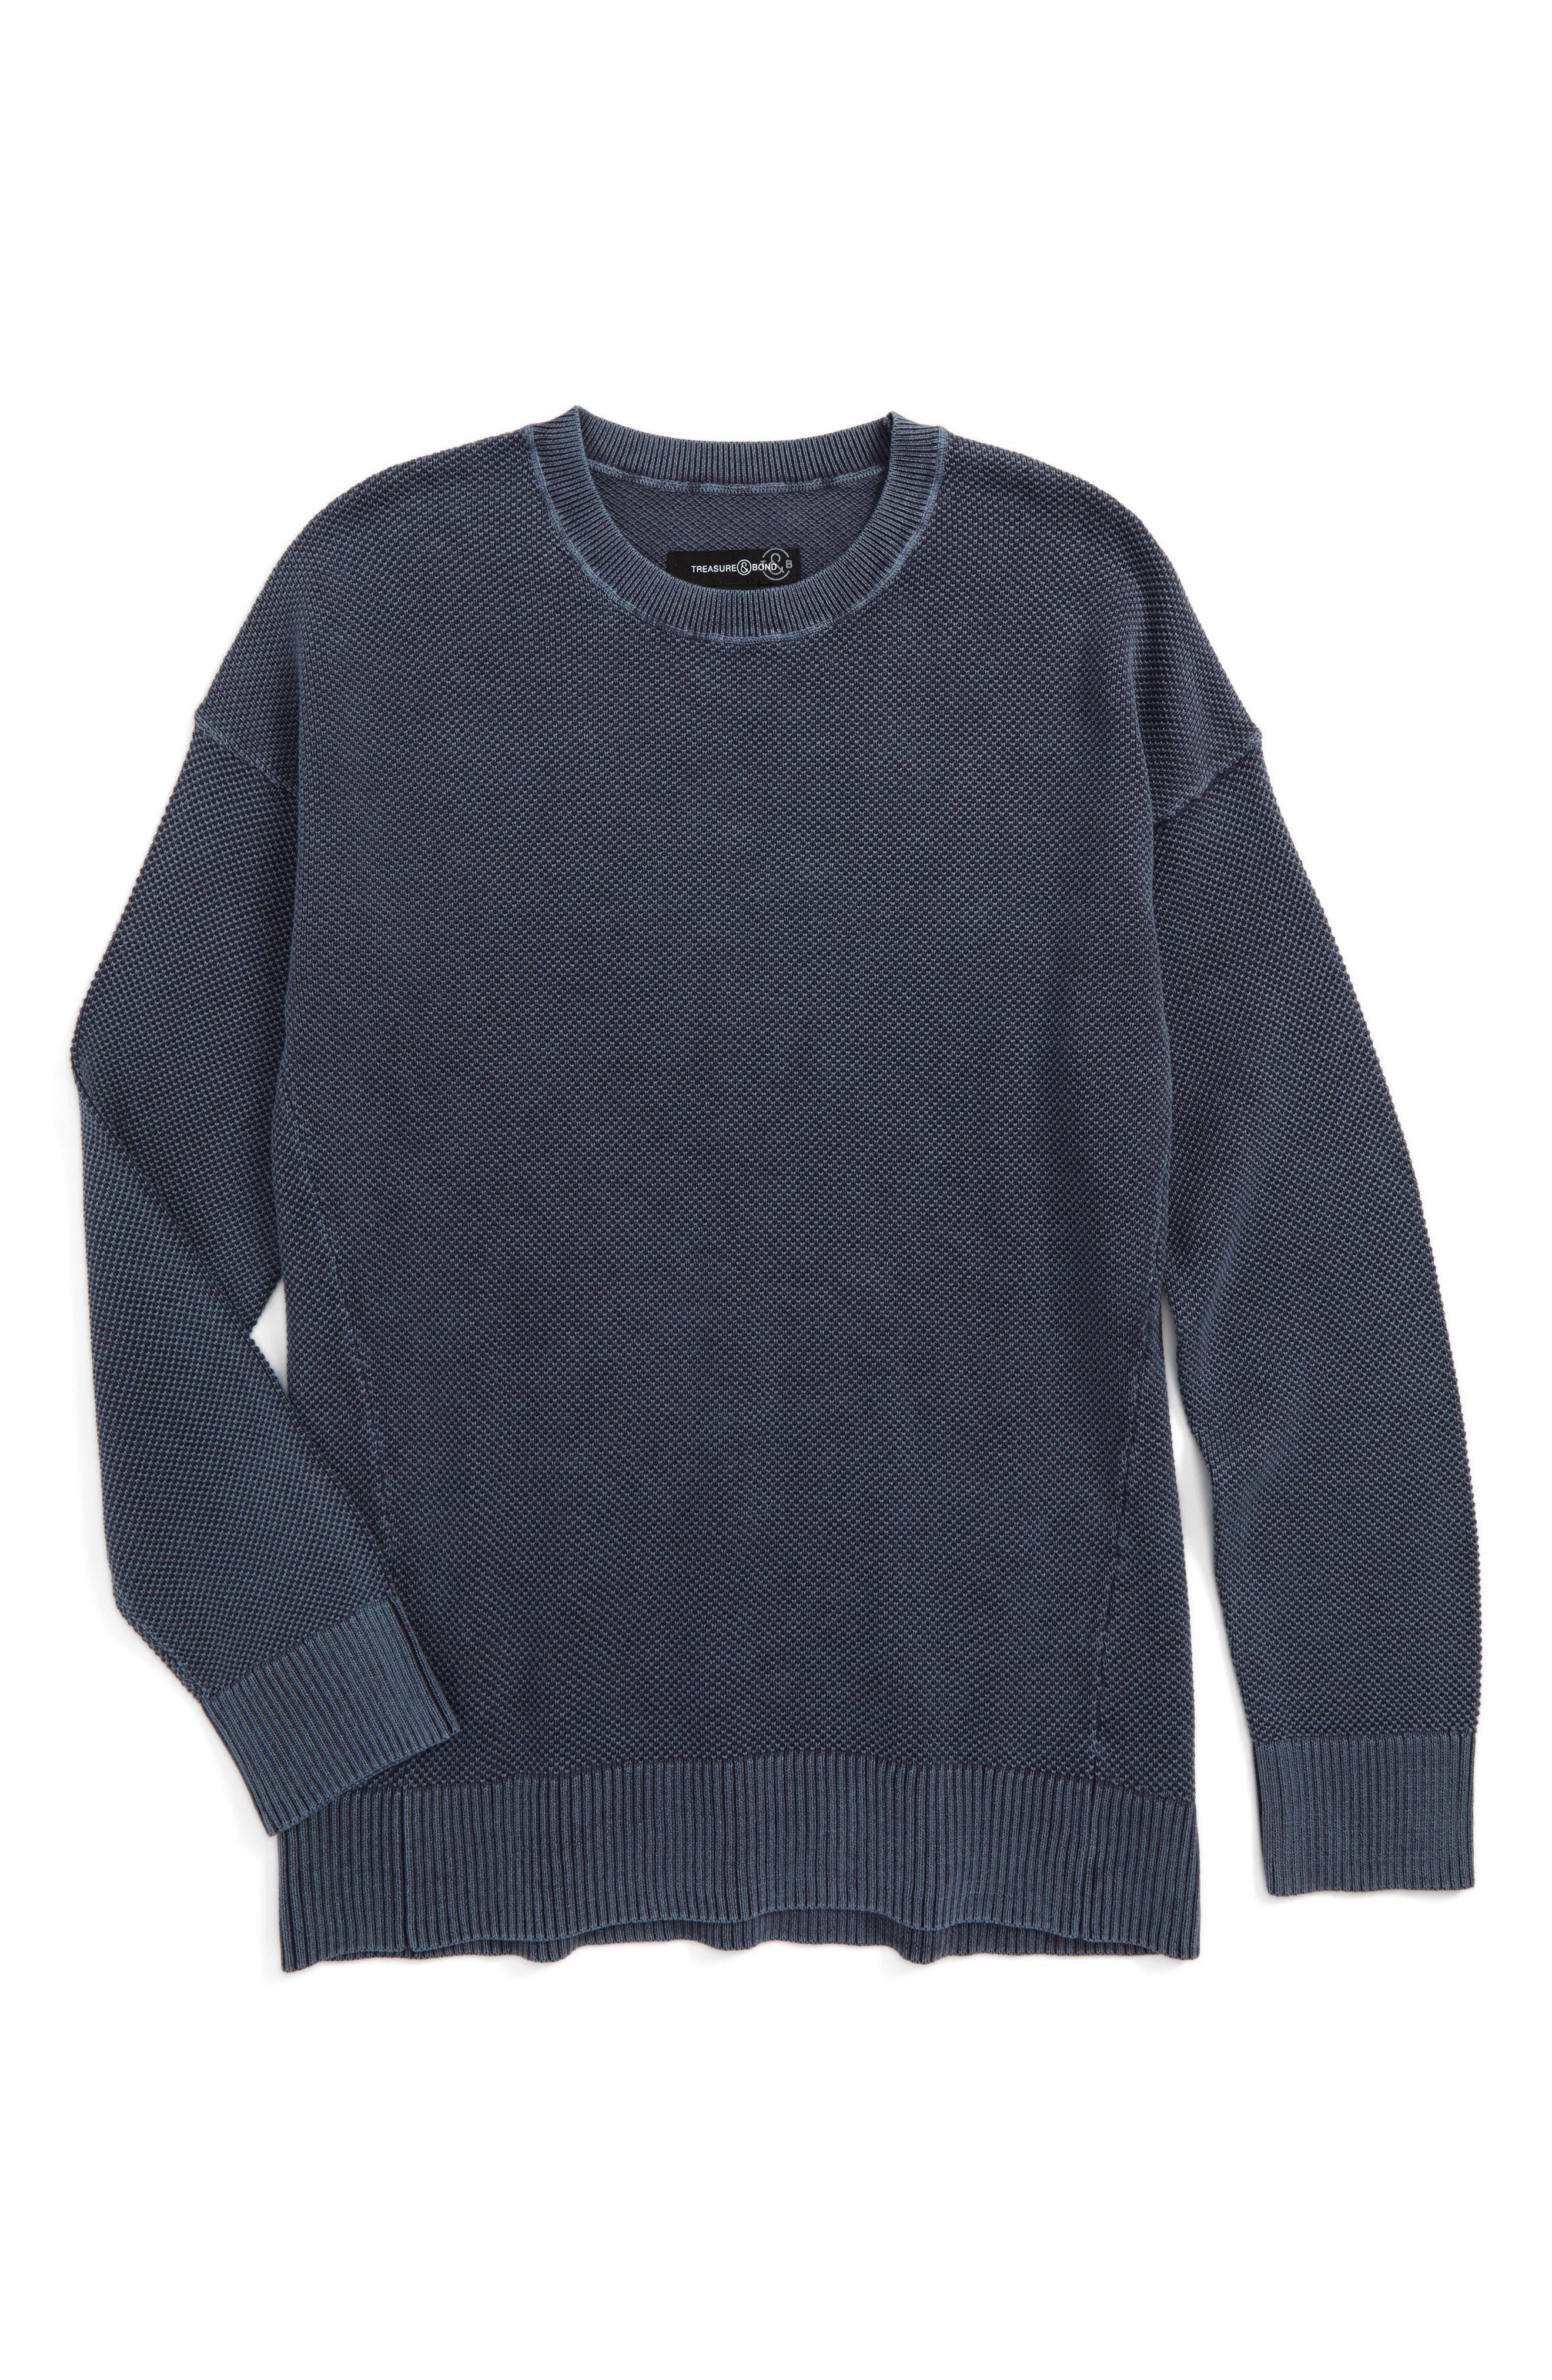 Waffle Knit Sweater,                             Main thumbnail 1, color,                             420